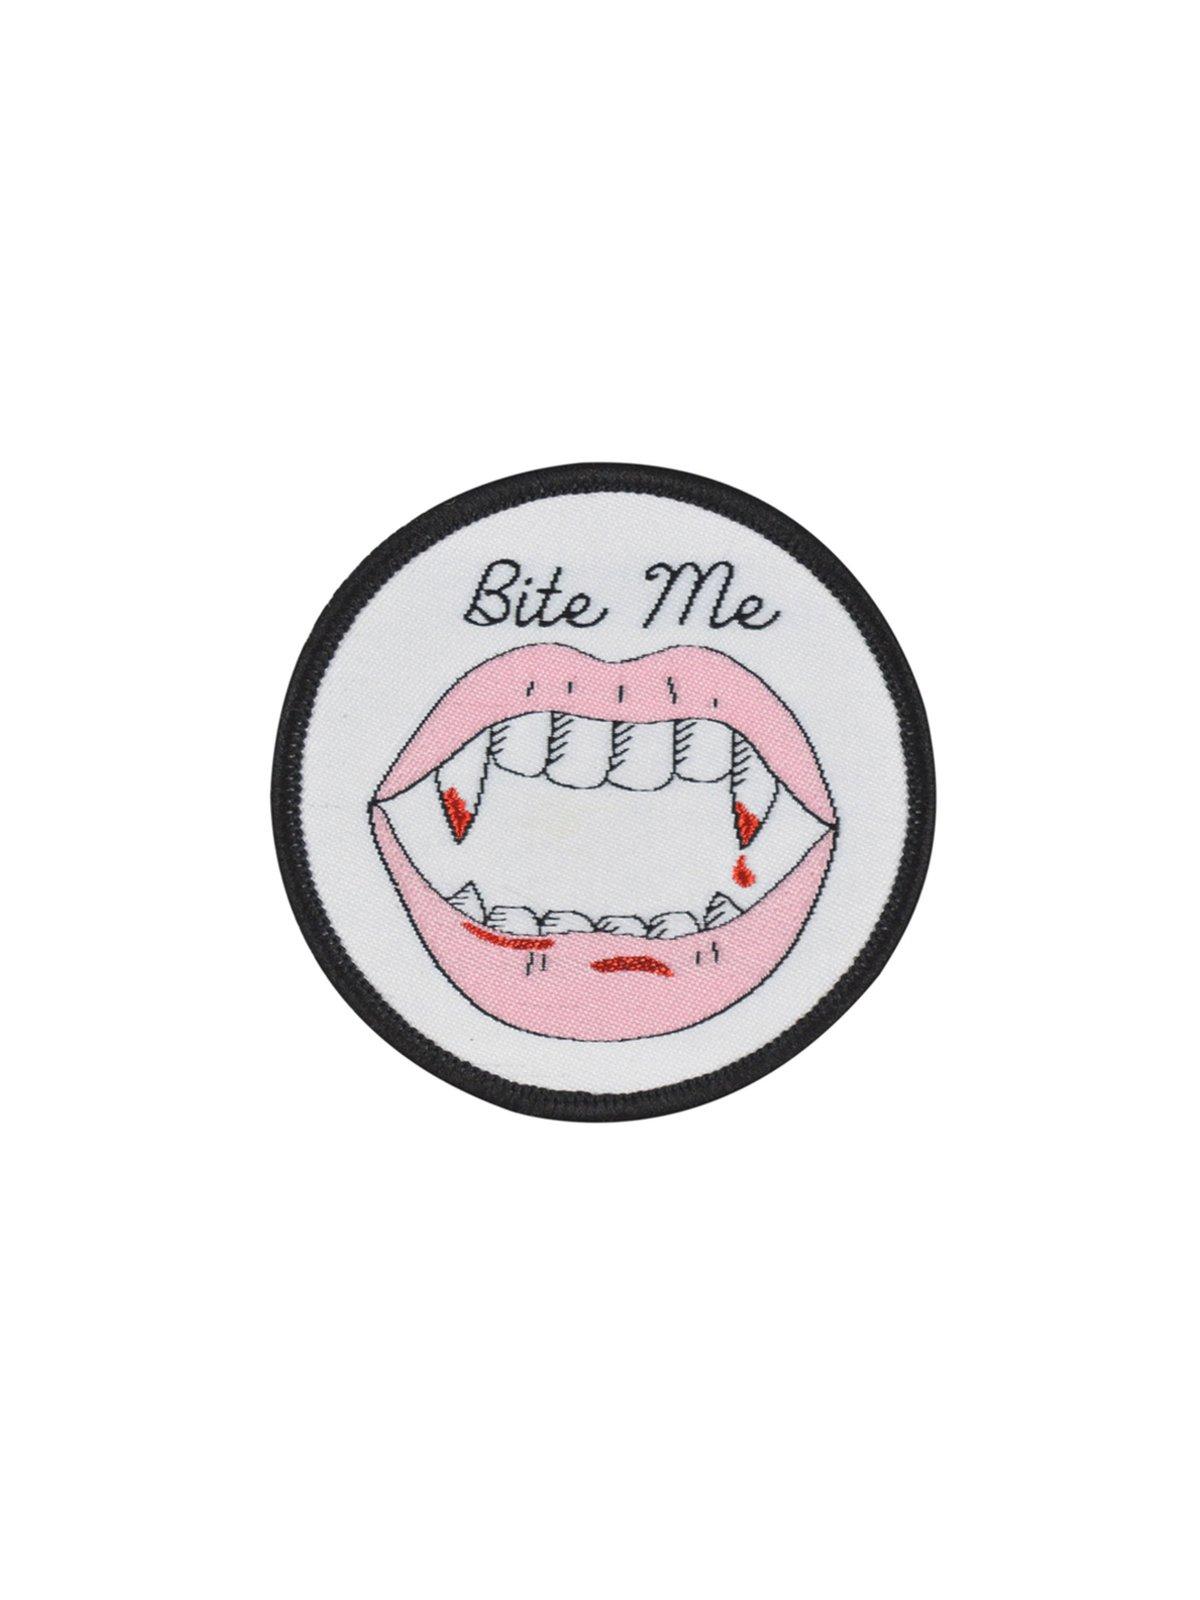 Bite Me Iron-on Patch